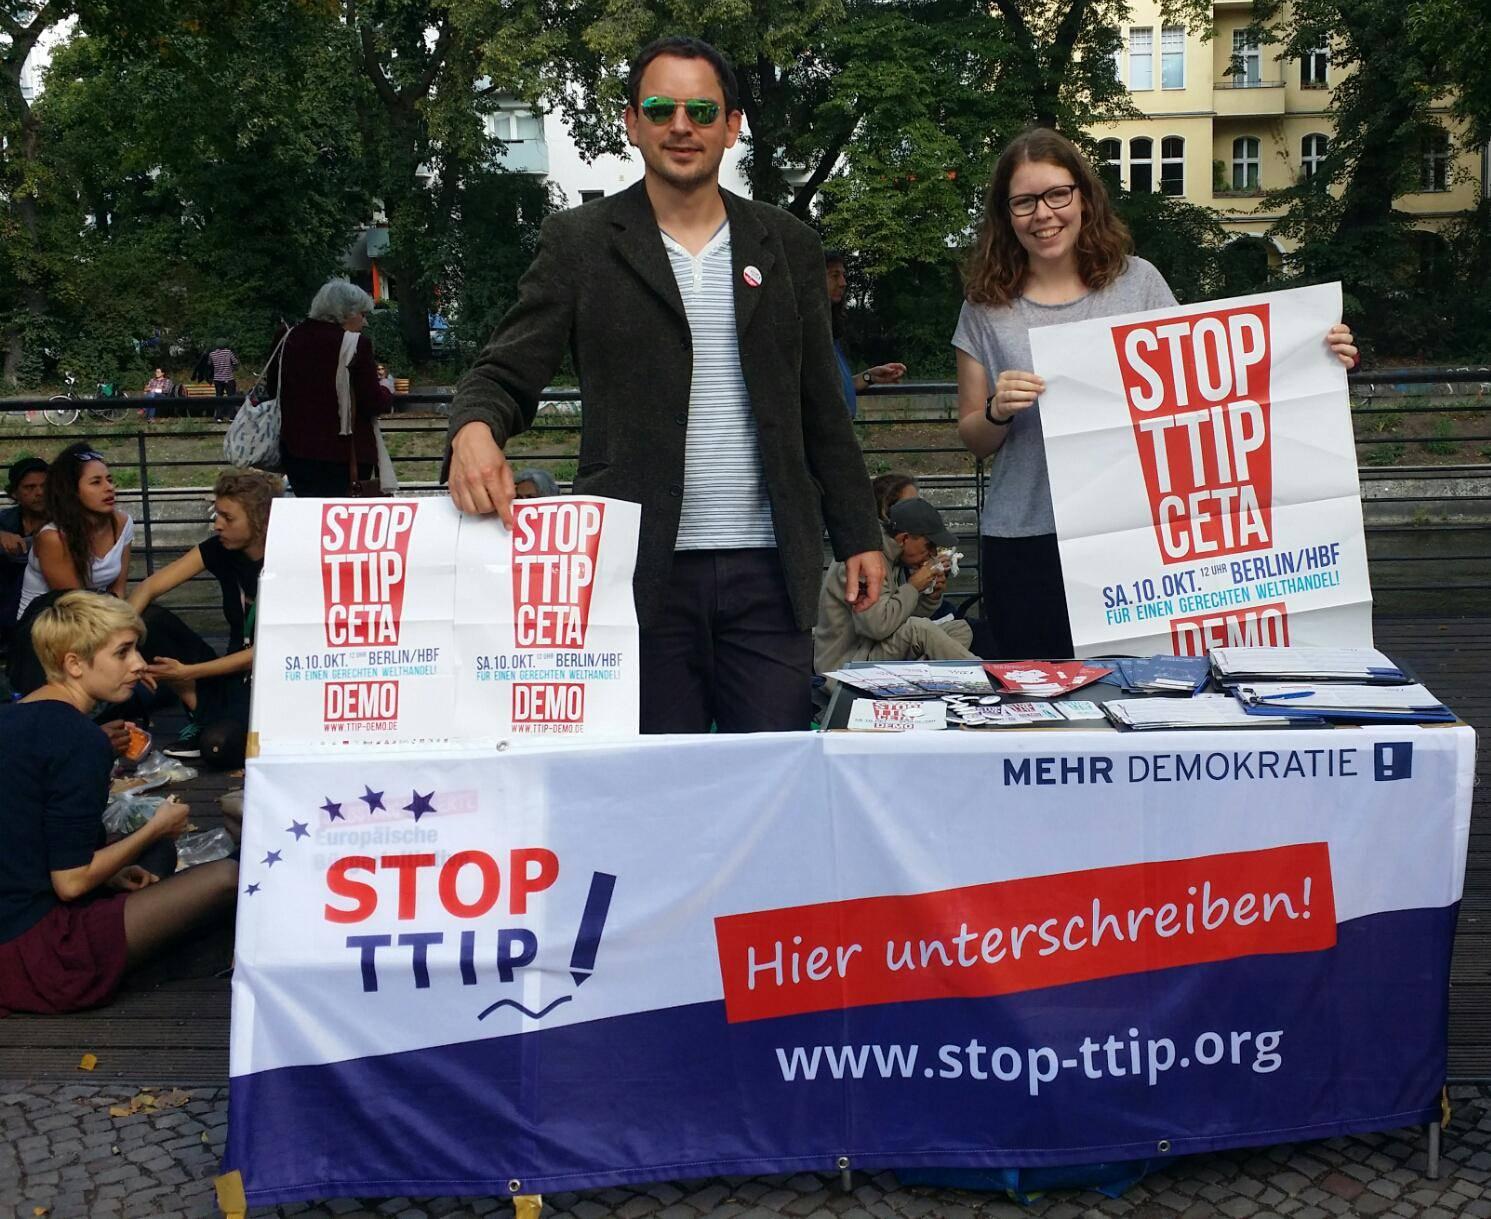 StopTTIP-Aktion am Maybachufer